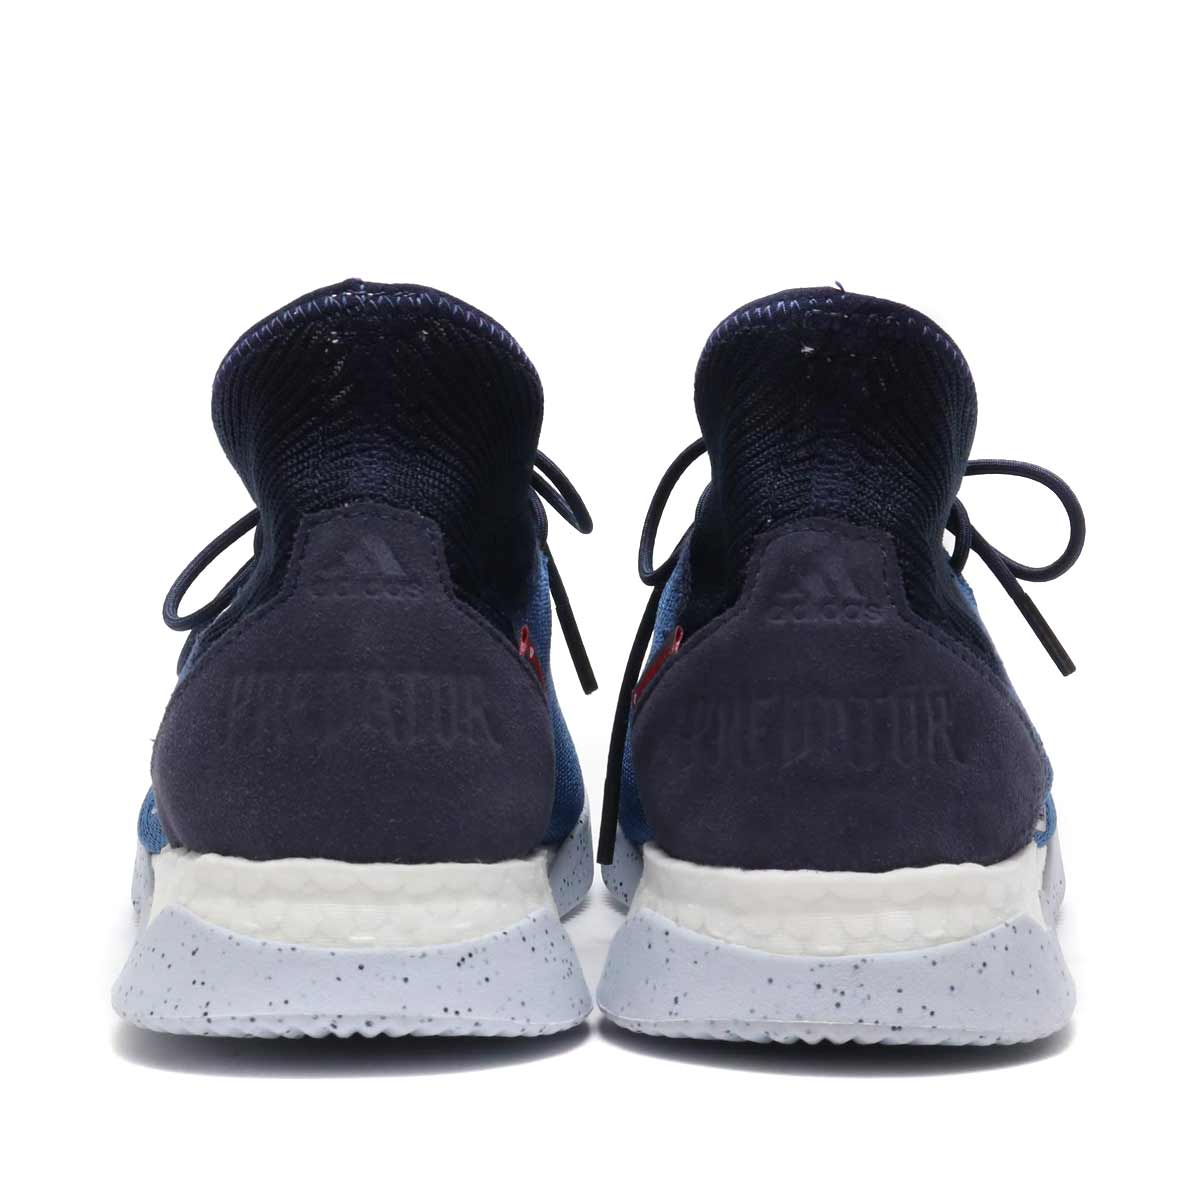 Großhandel adidas PREDATOR TANGO 18.1 TR (Adidas predator